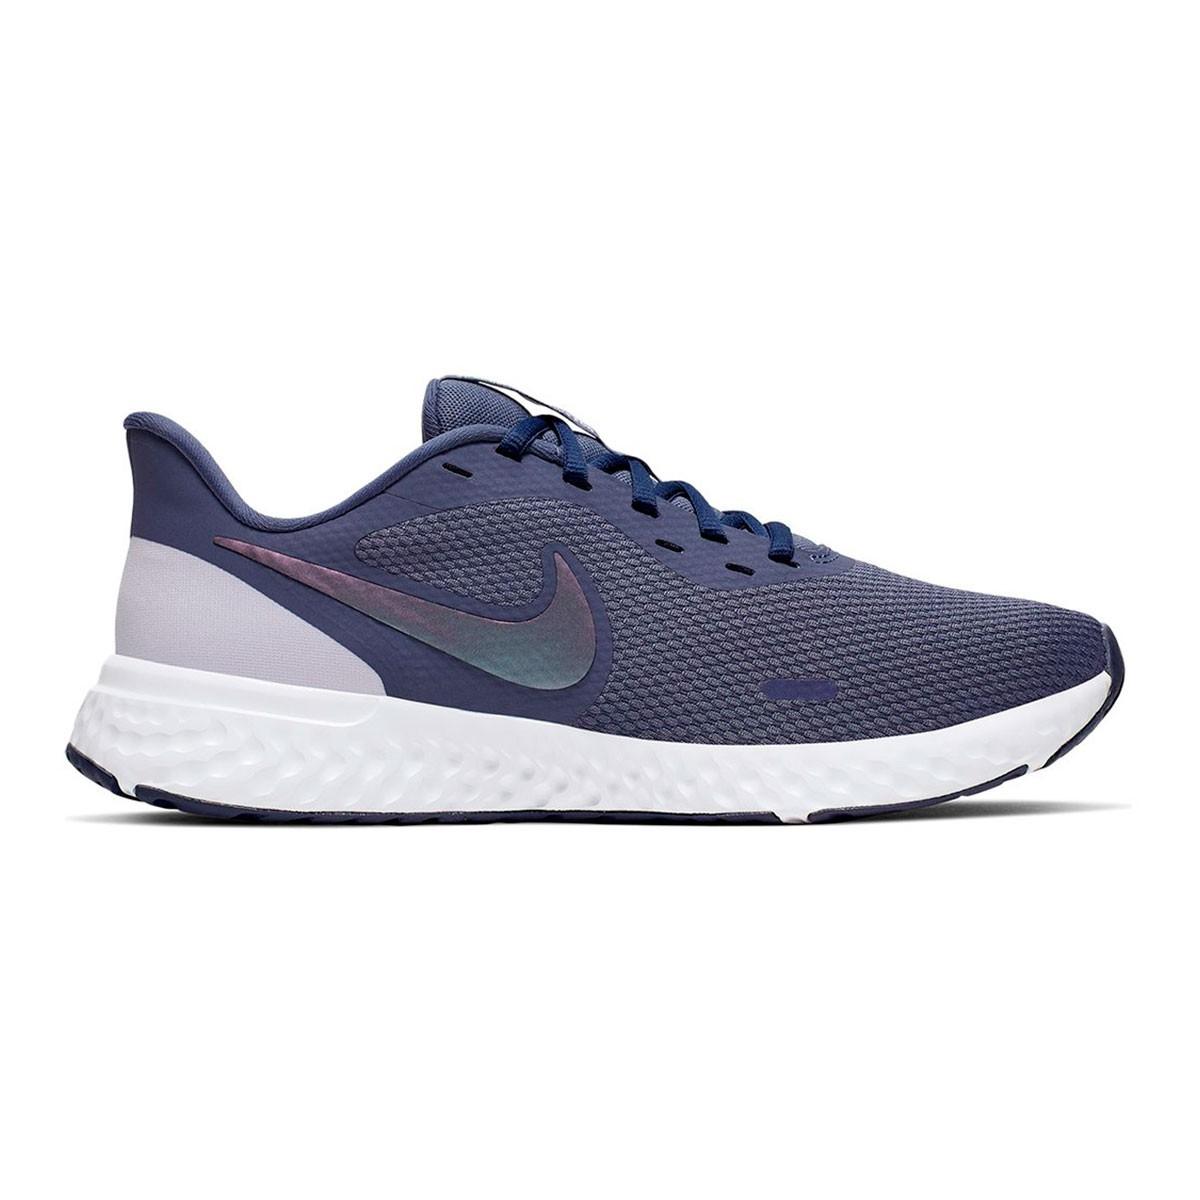 Tênis Nike Revolution 5 Feminino Roxo